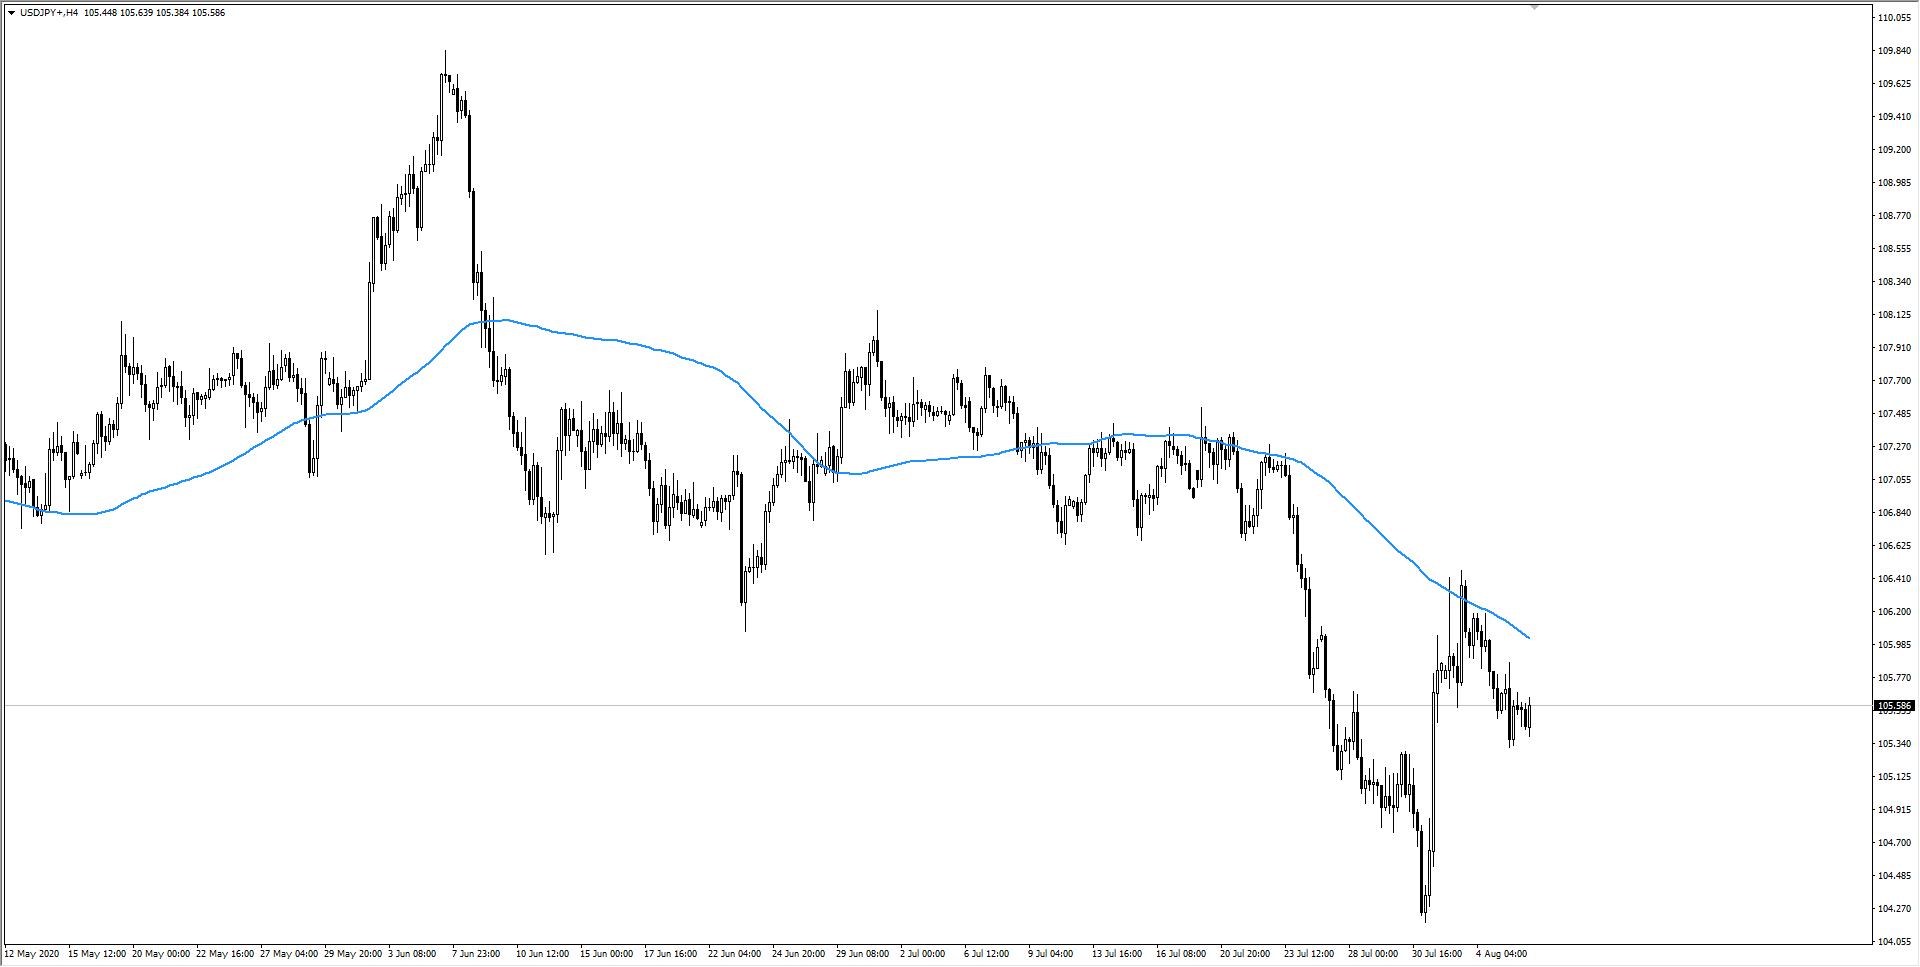 wykres Kurs dolara USDJPY 06.08.2020